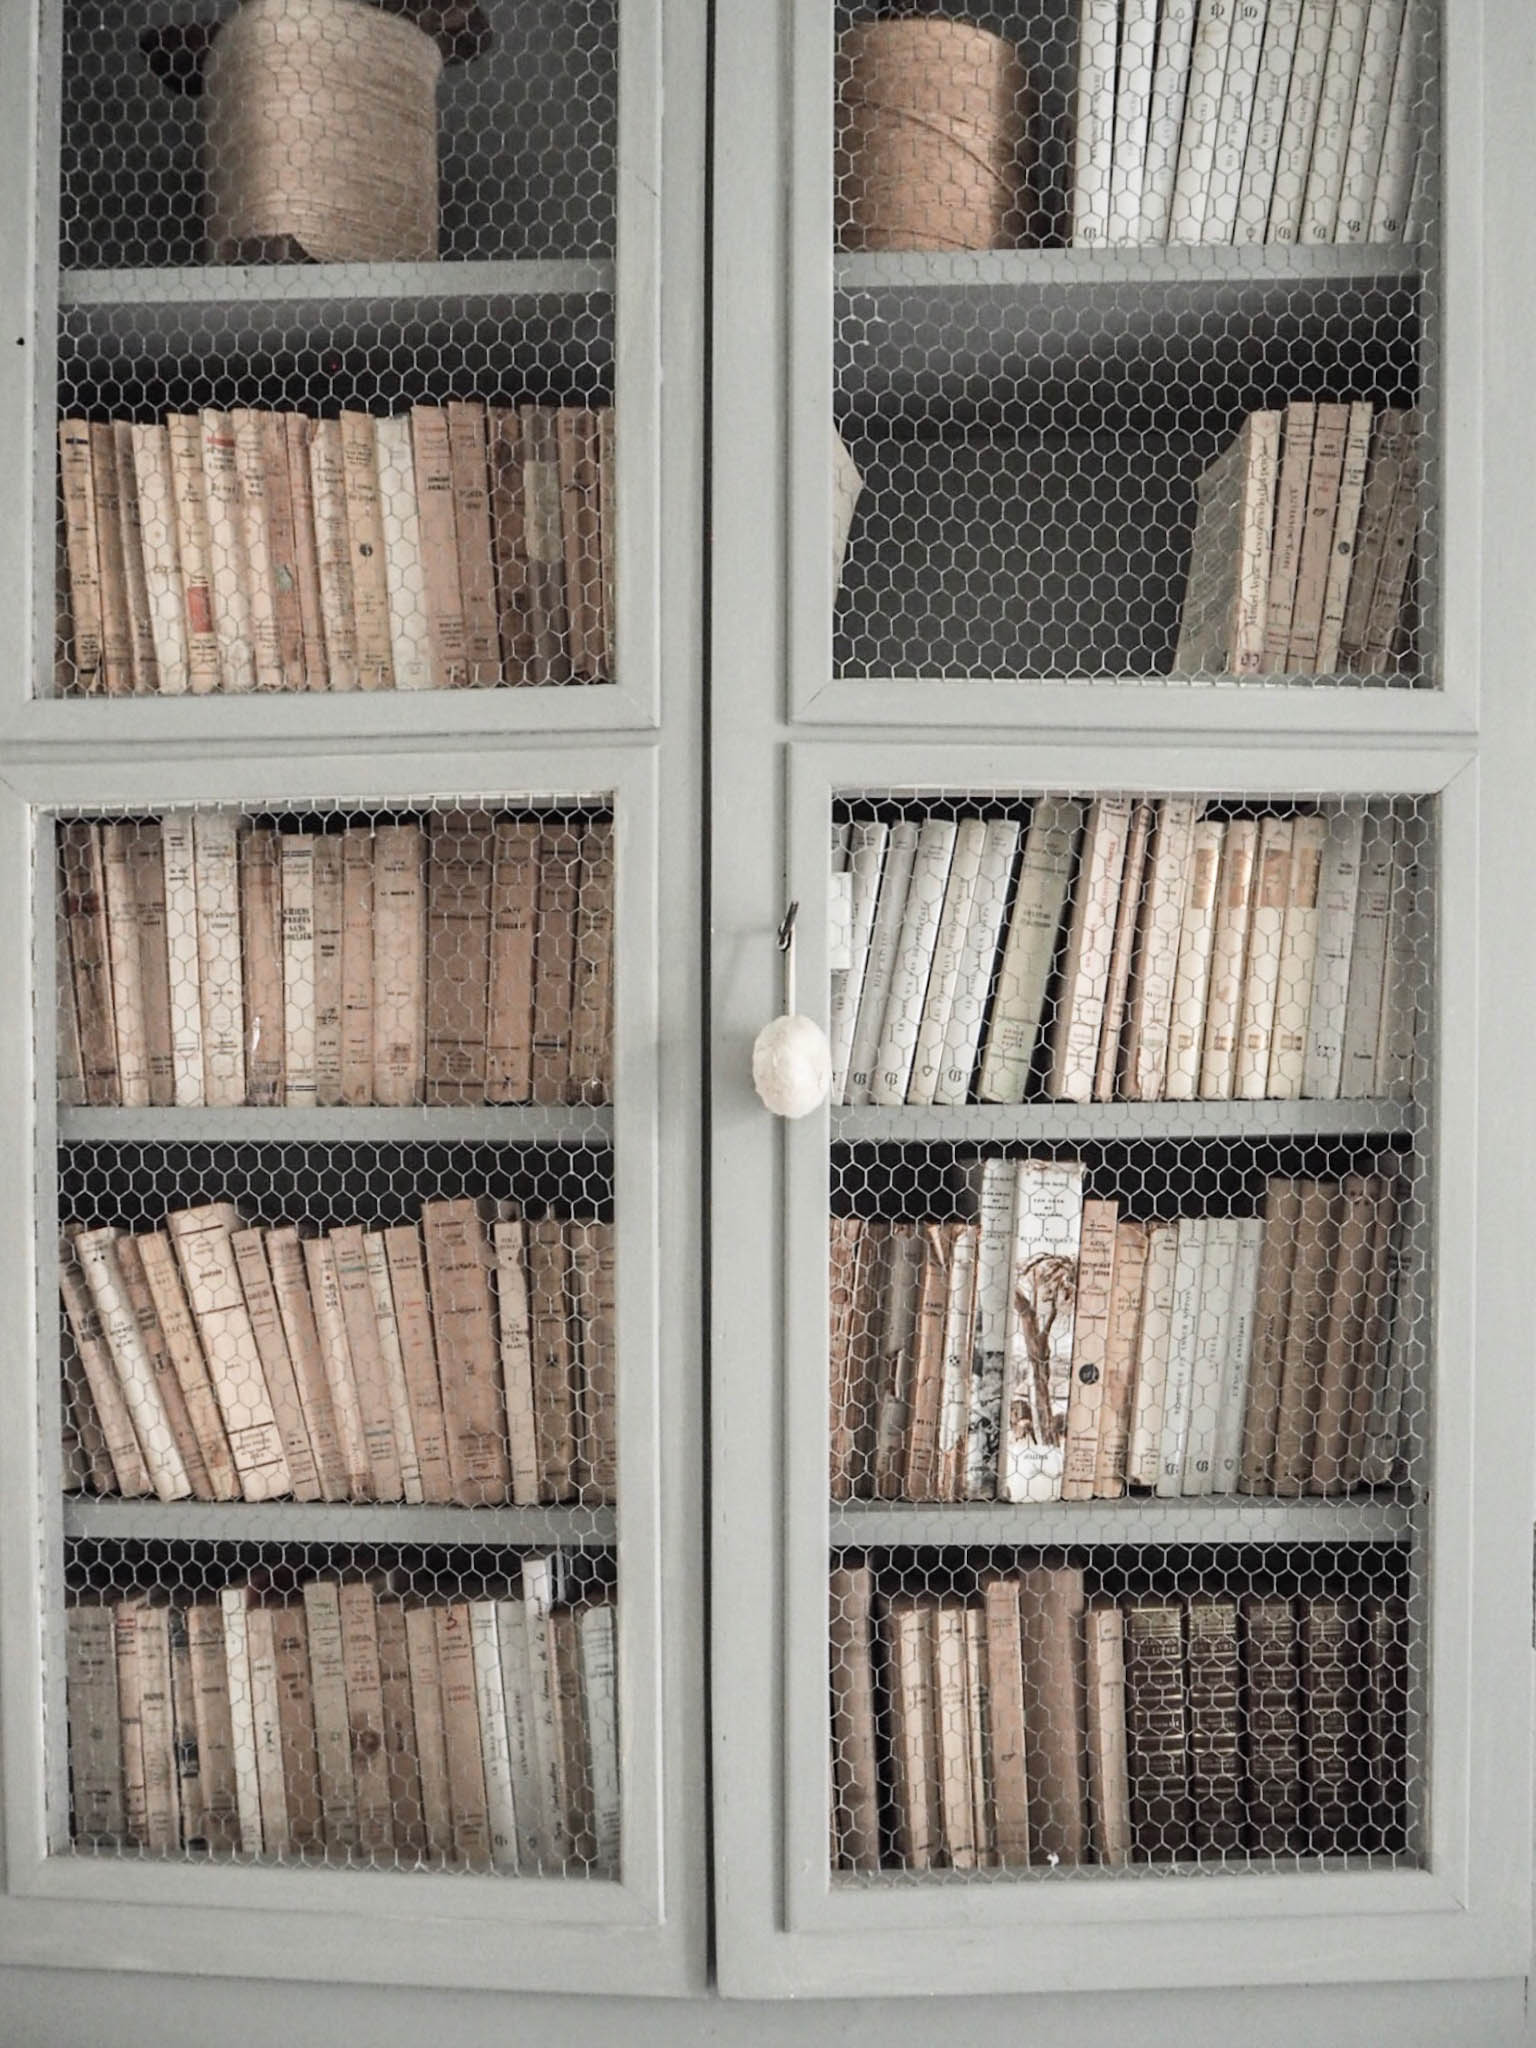 camellas-lloret-maison-d'hotes-room-2-library.jpg